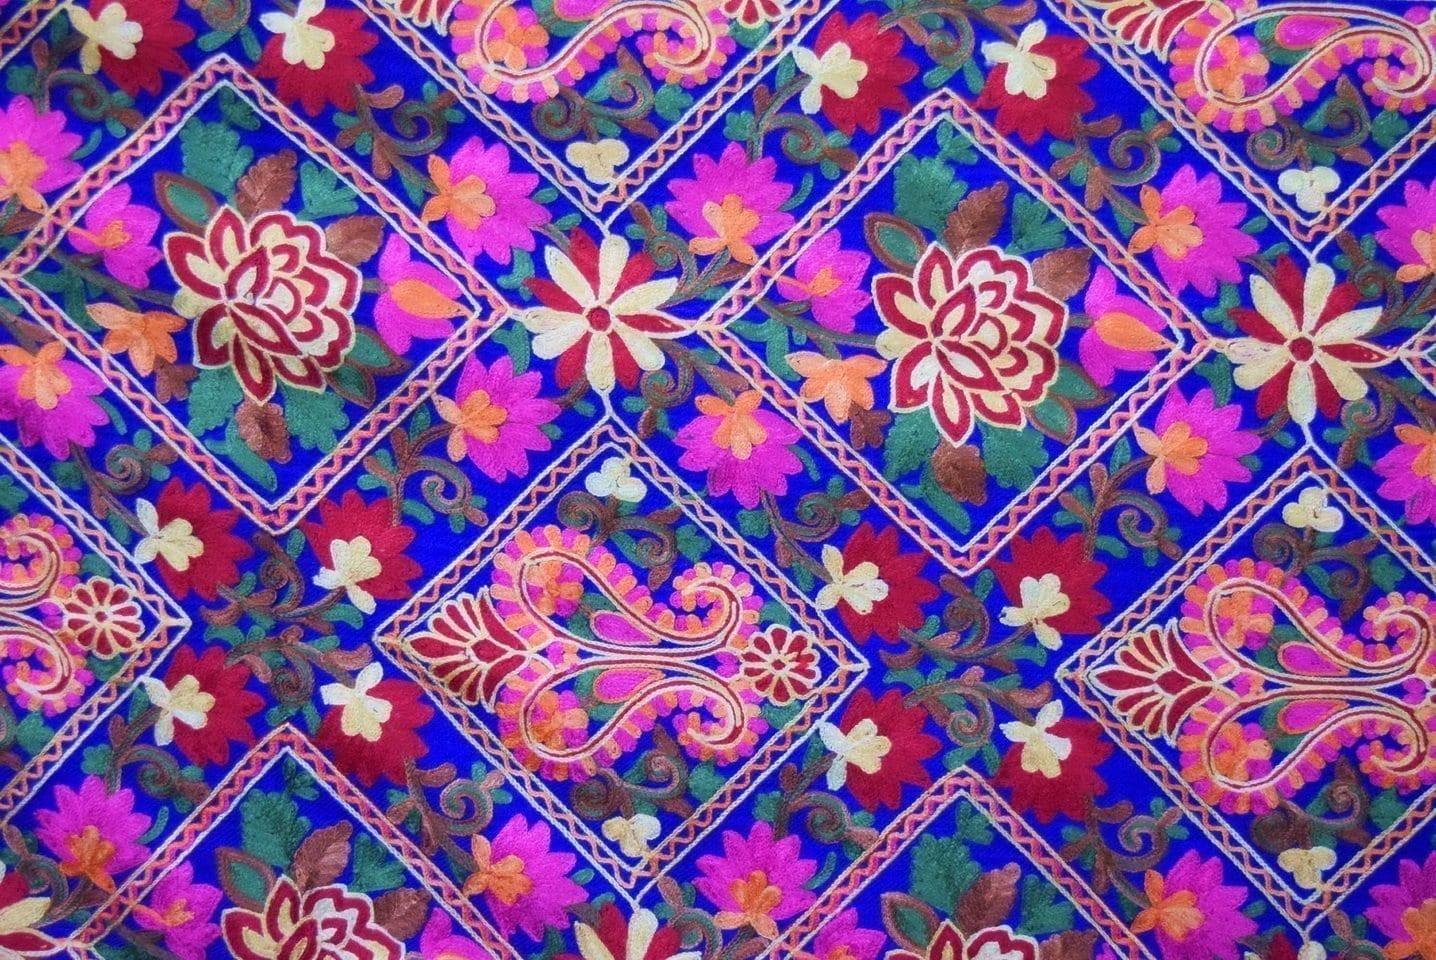 Royal Blue Kashmiri Stole Multicolour Heavy Embroidery Work pure wool Pashmina C0686 2